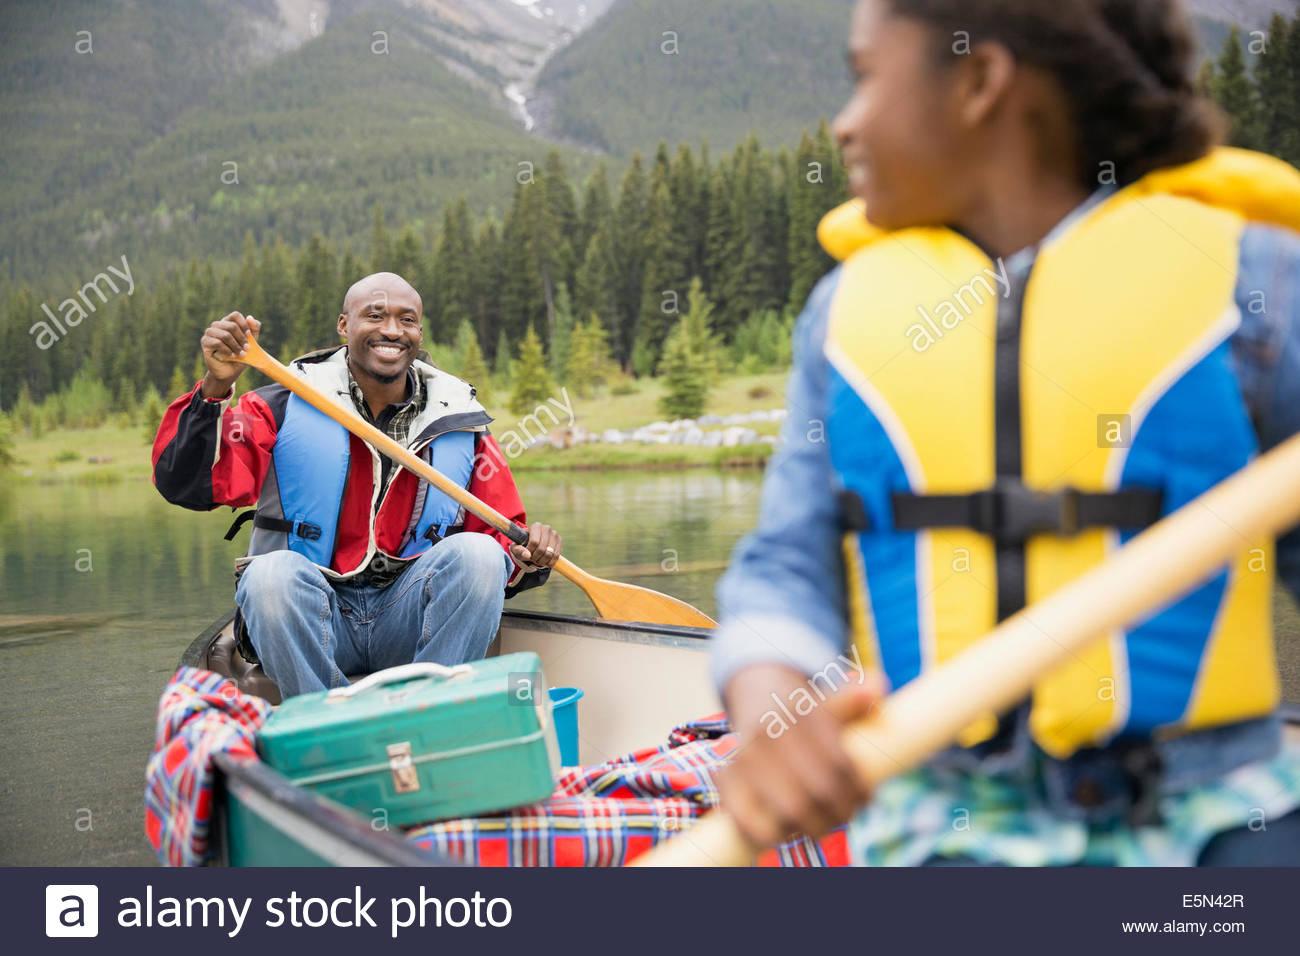 Padre e hija, canotaje en el lago Imagen De Stock